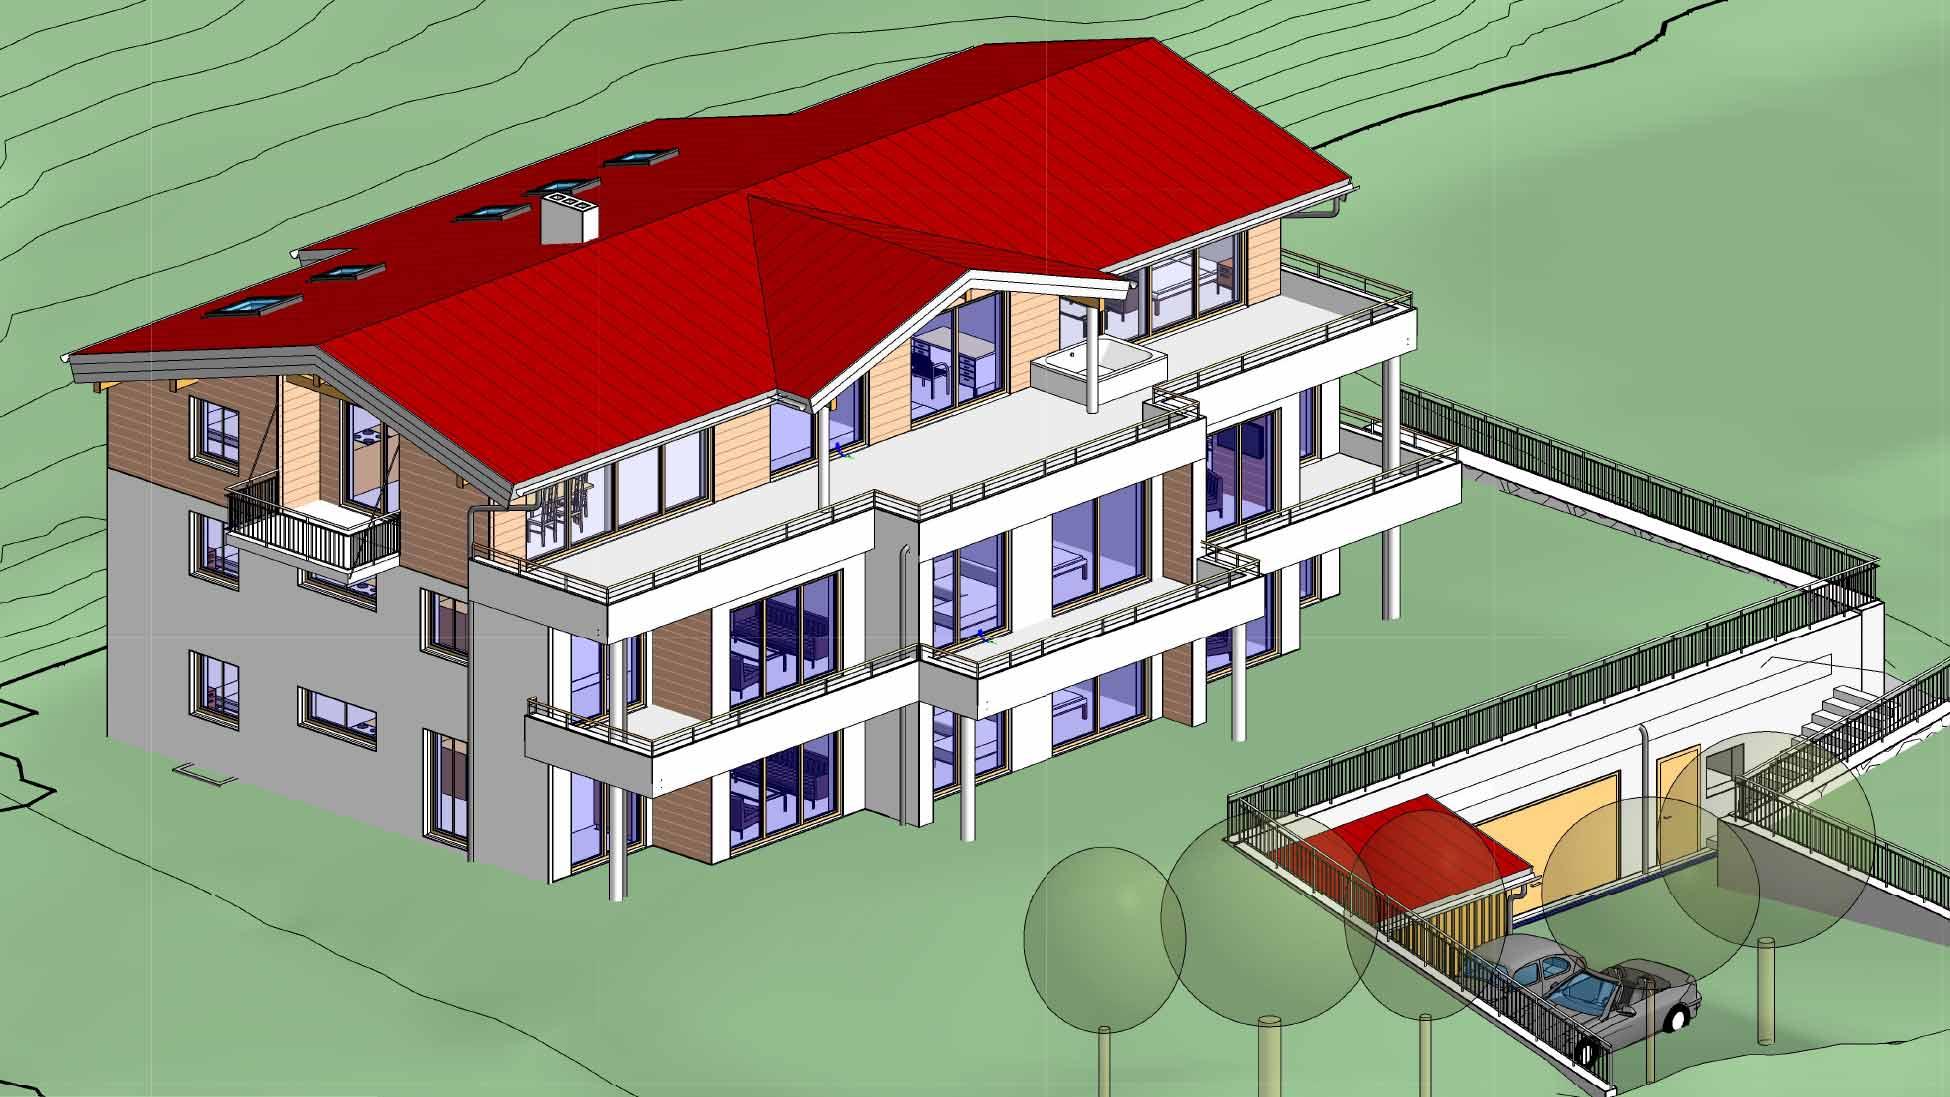 Statik Wohngebäude